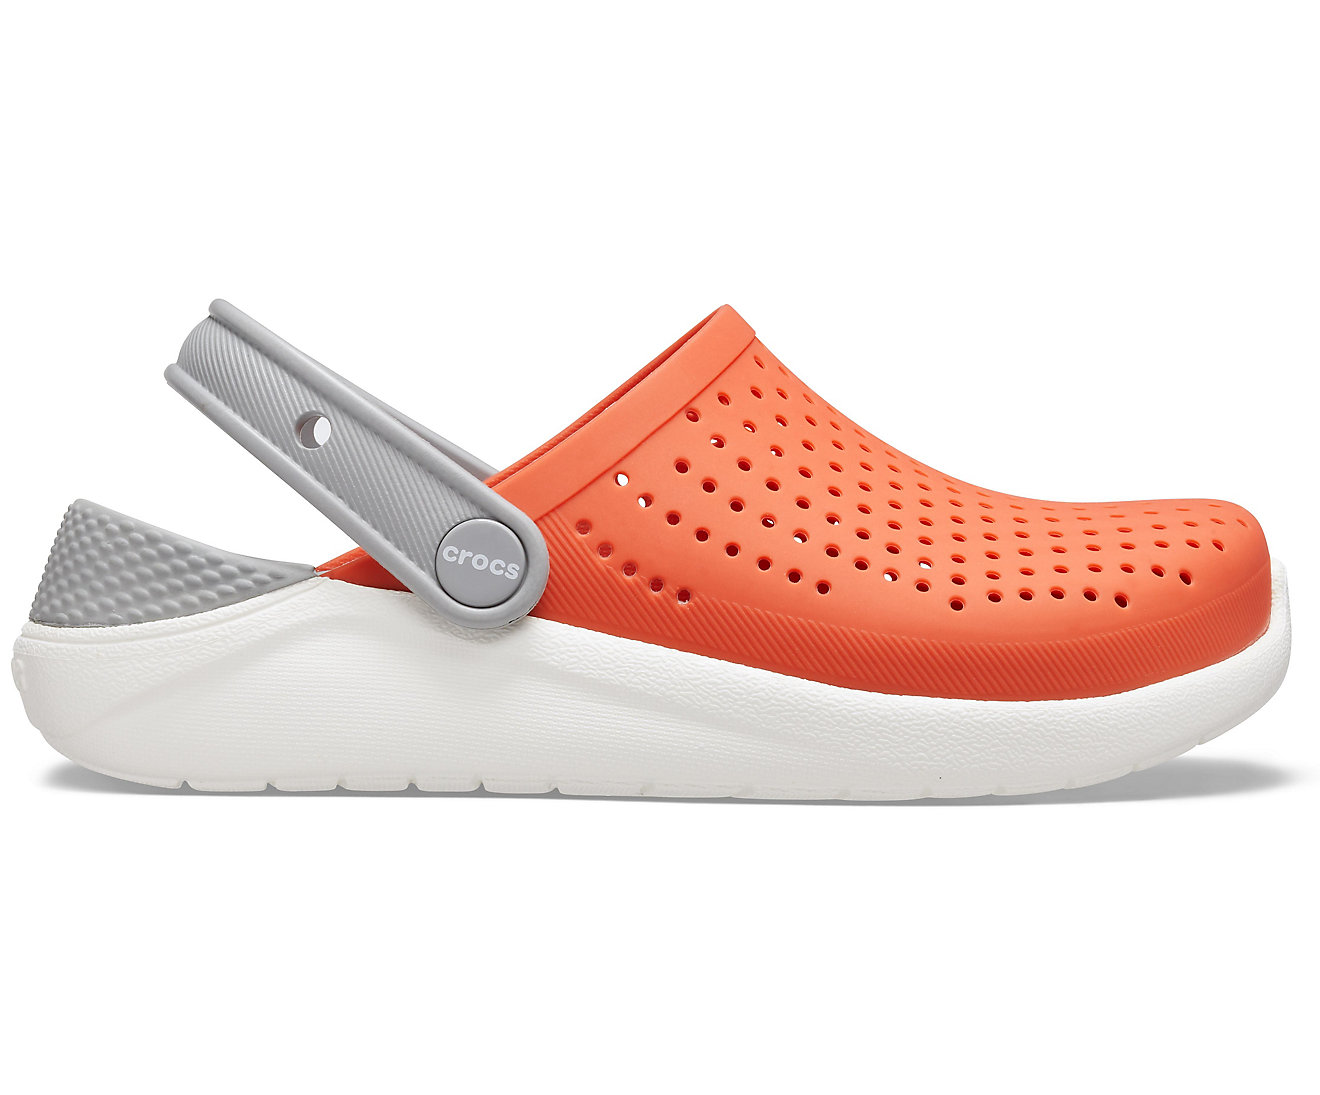 Crocs Literide Clog Kid's Tangerine/White